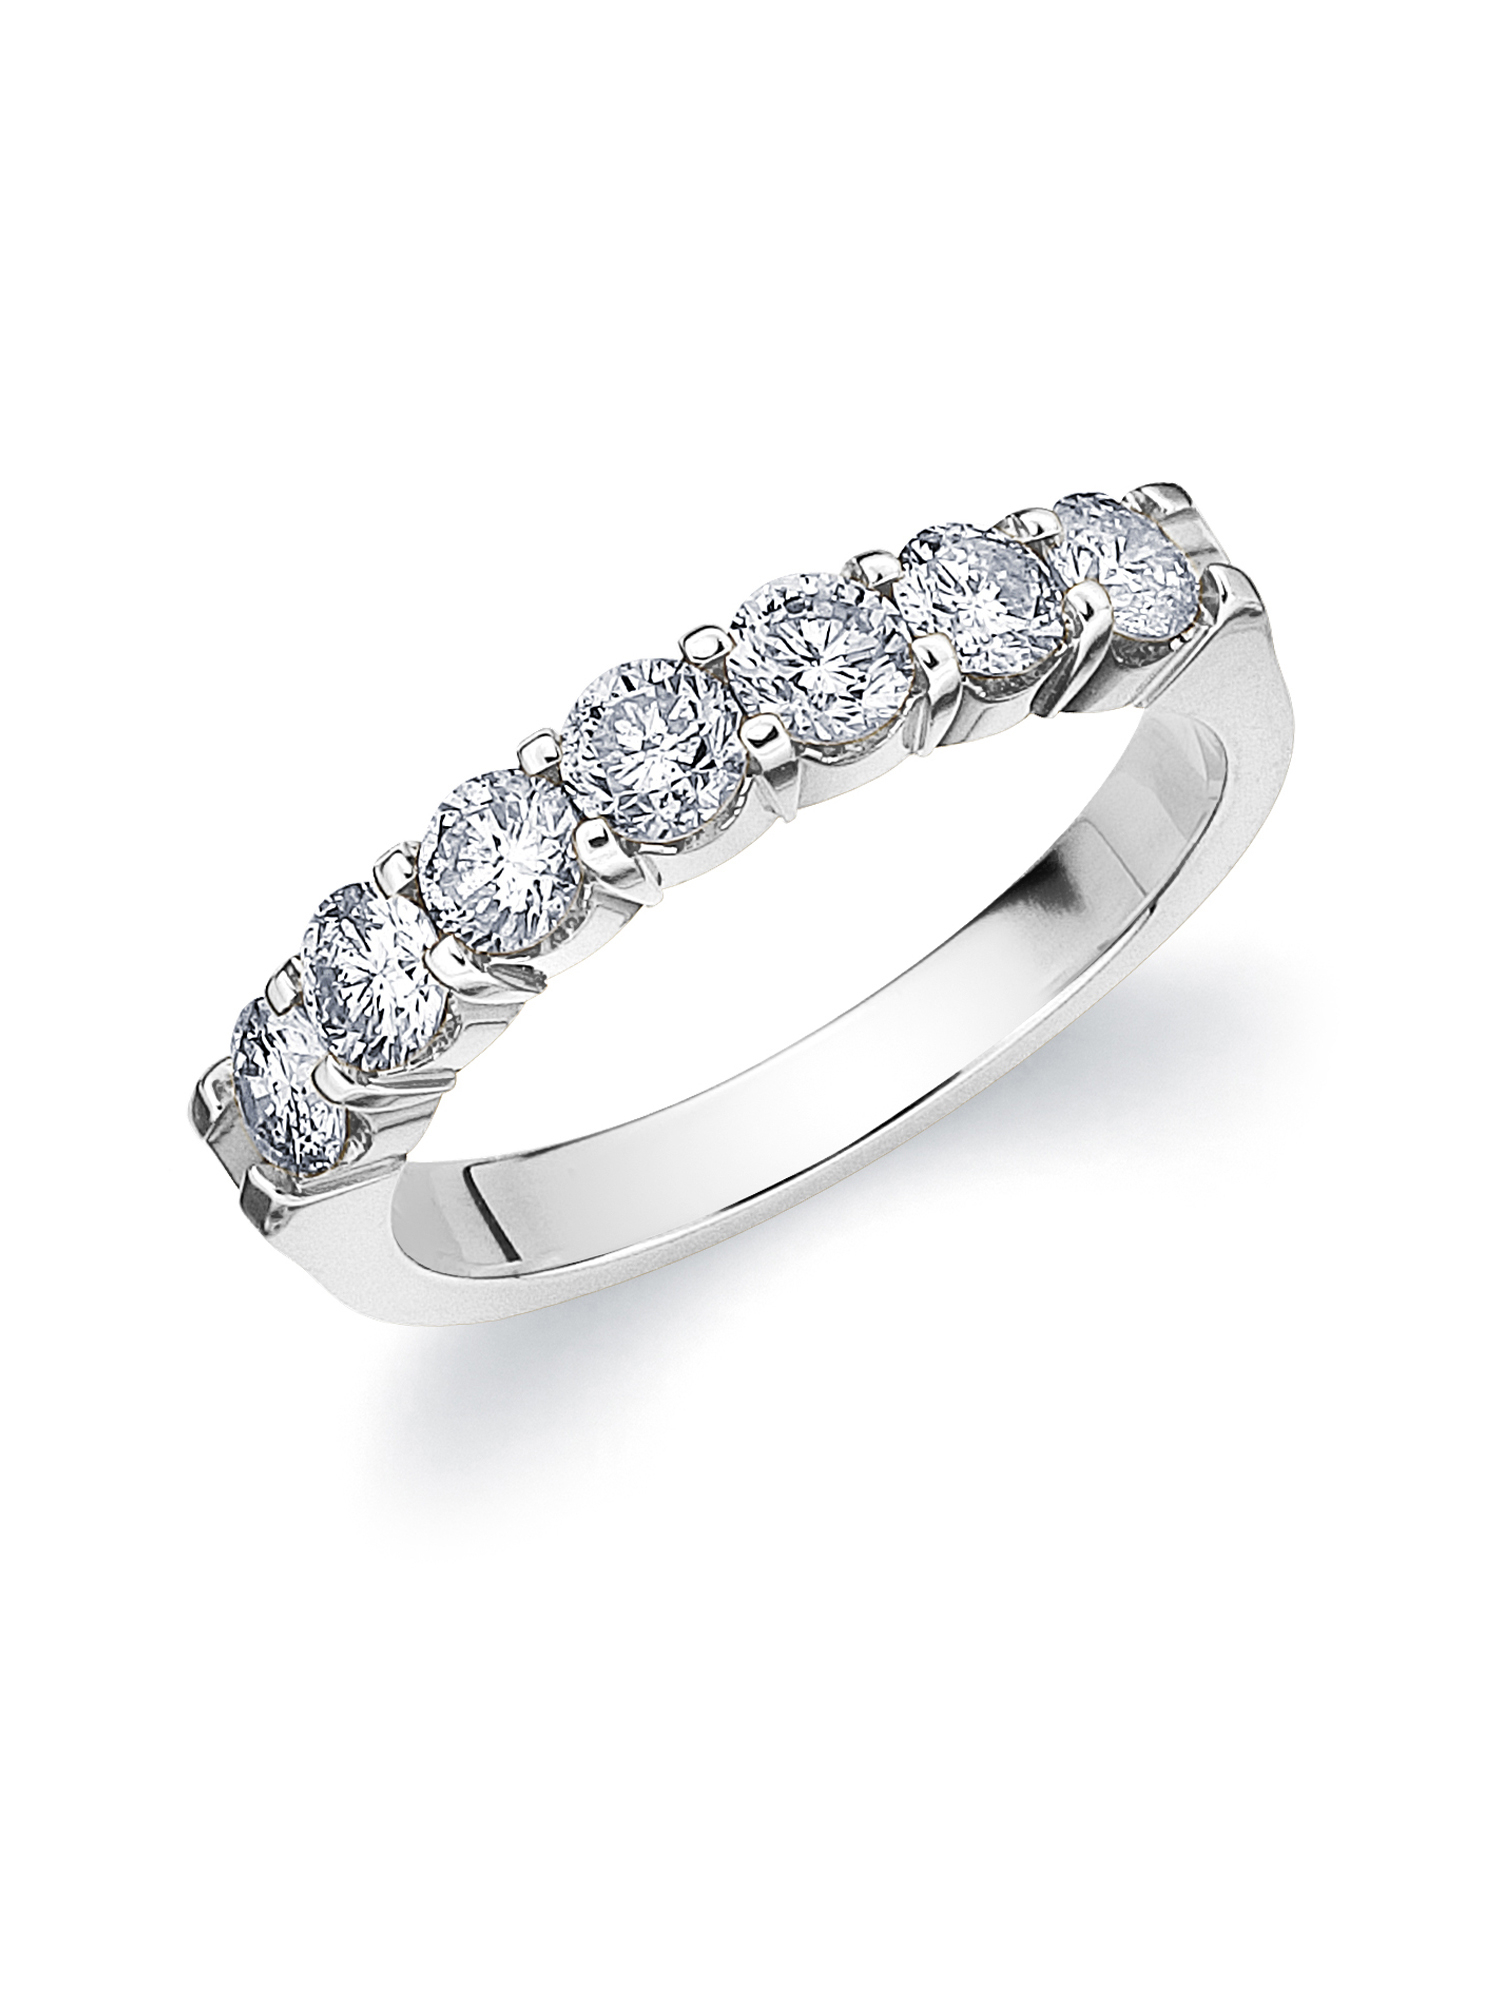 1 Ct Diamond Seven Stones Wedding Band, White Gold Diamond Anniversary Ring With Newest Diamond Seven Stone Anniversary Bands In White Gold (View 2 of 25)